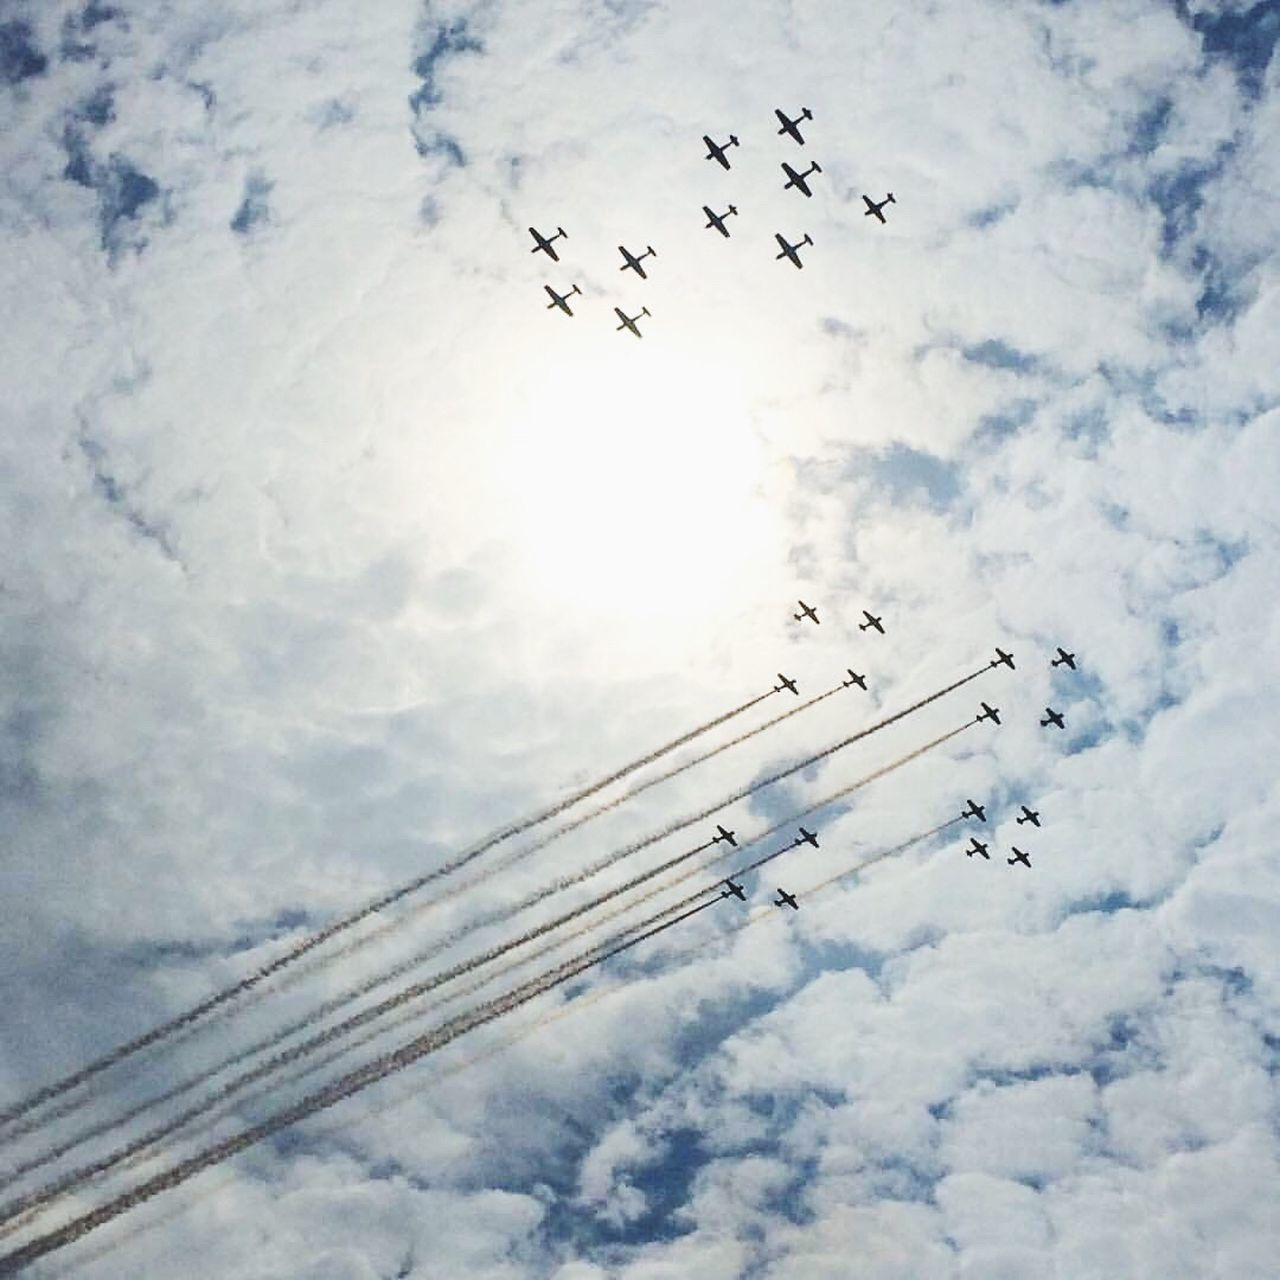 Eaa Airplane Jet Clouds Formation Figure Plane Sky Pilot